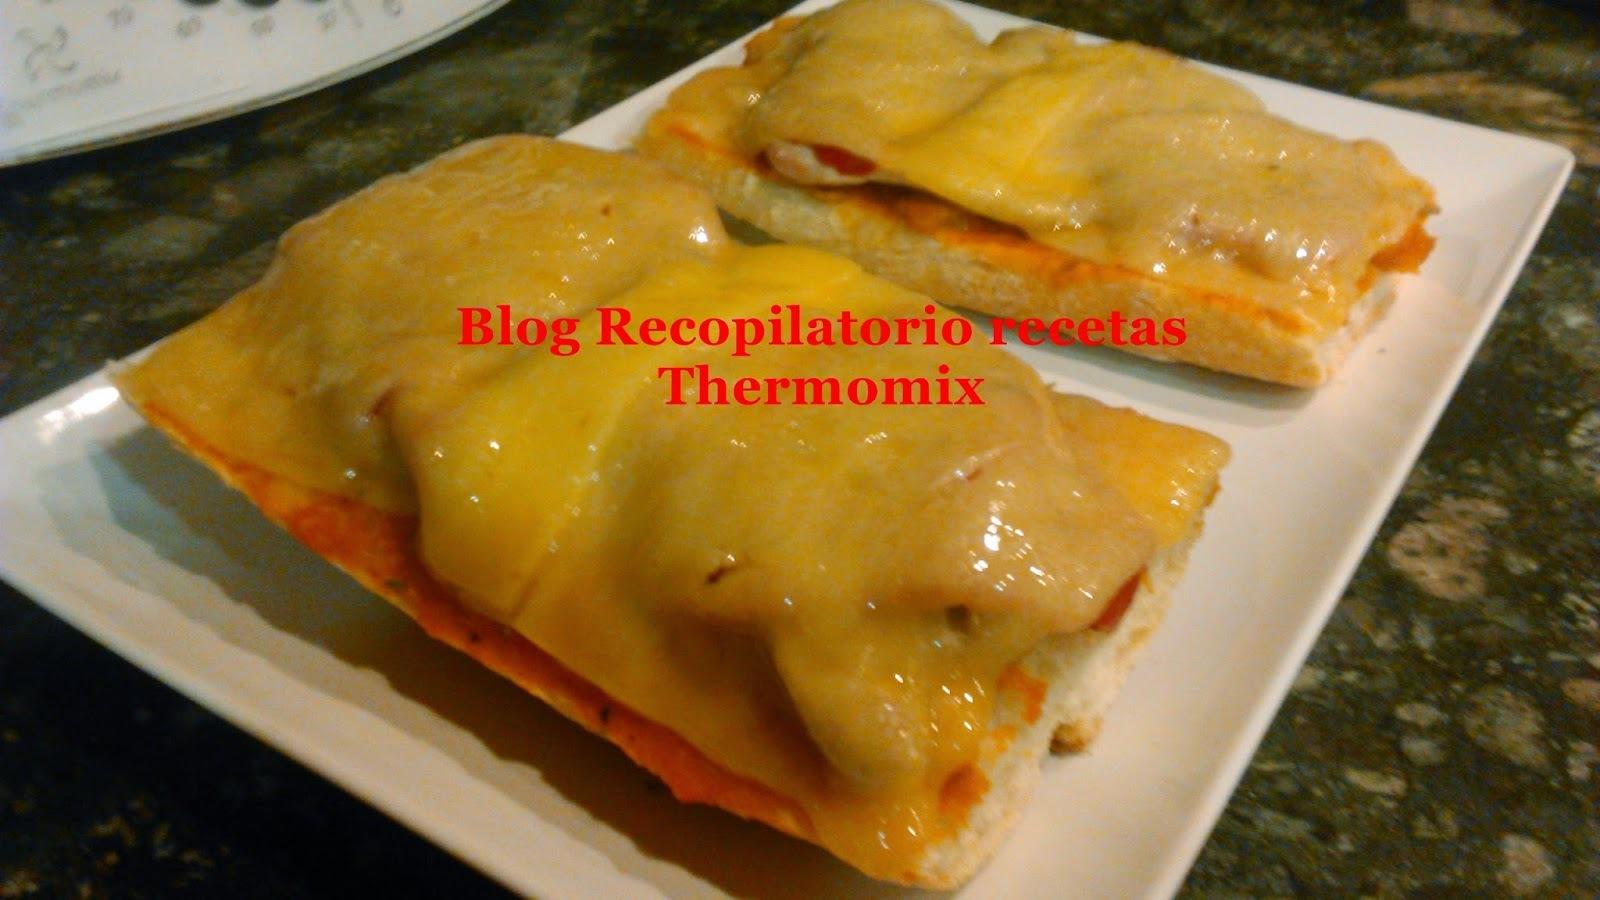 Alpargartas con thermomix